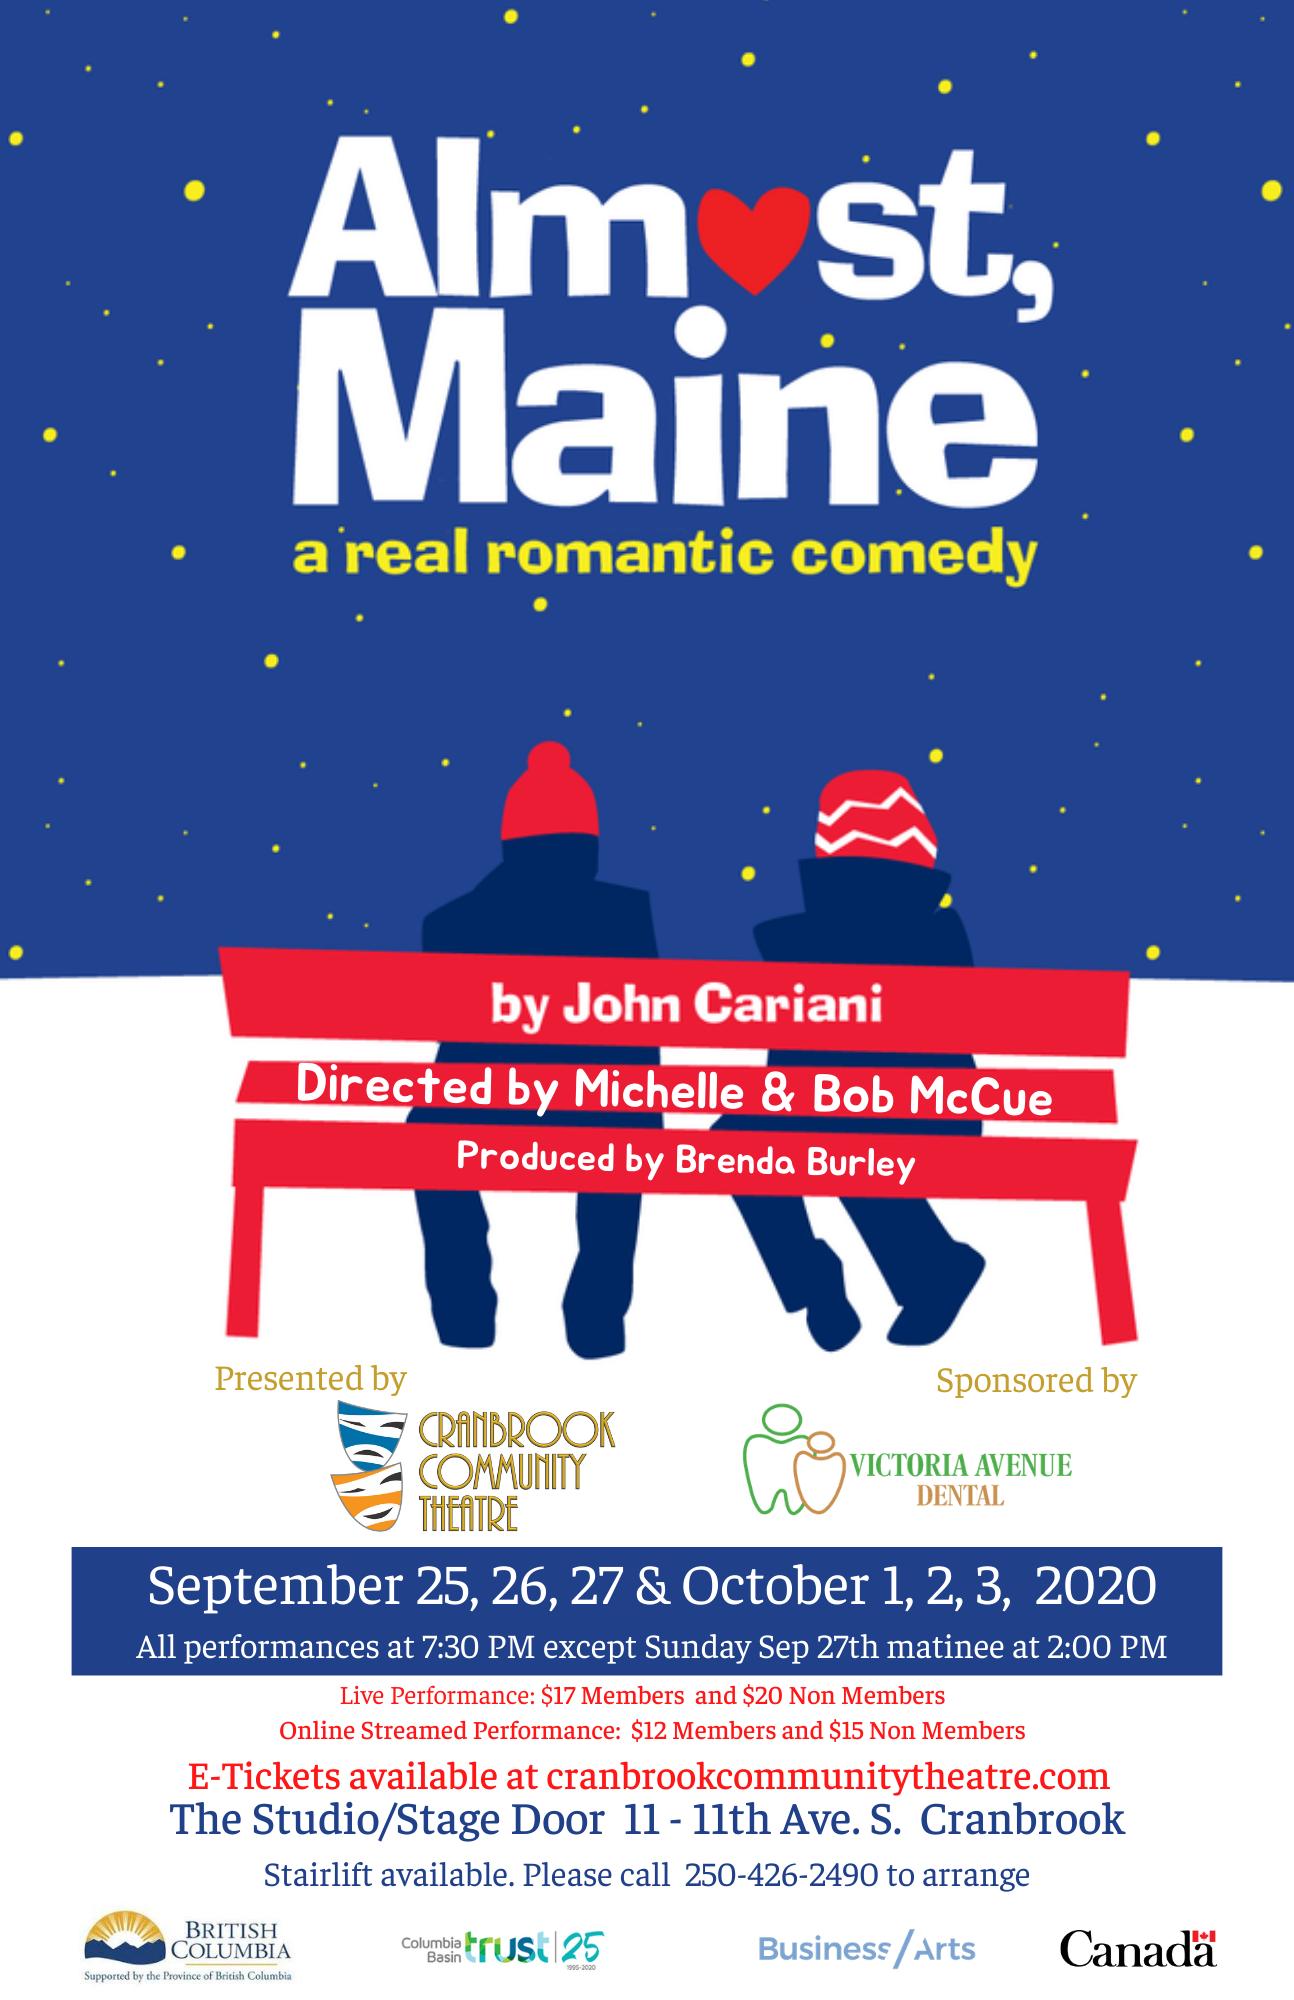 Almost Maine 2020